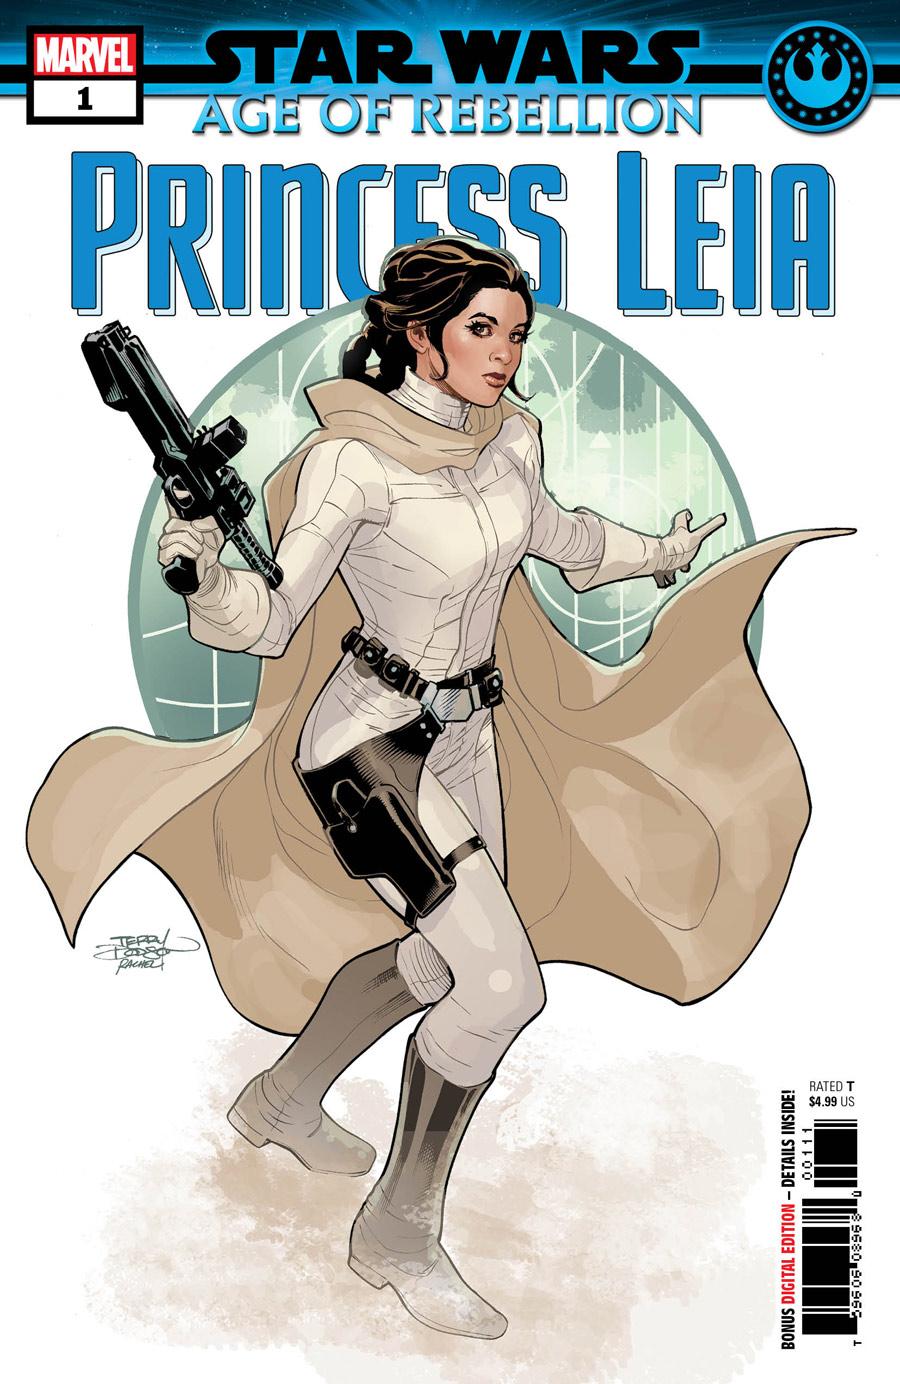 Star Wars: Age of Rebellion - Princess Leia #1, copertina di Terry Dodson